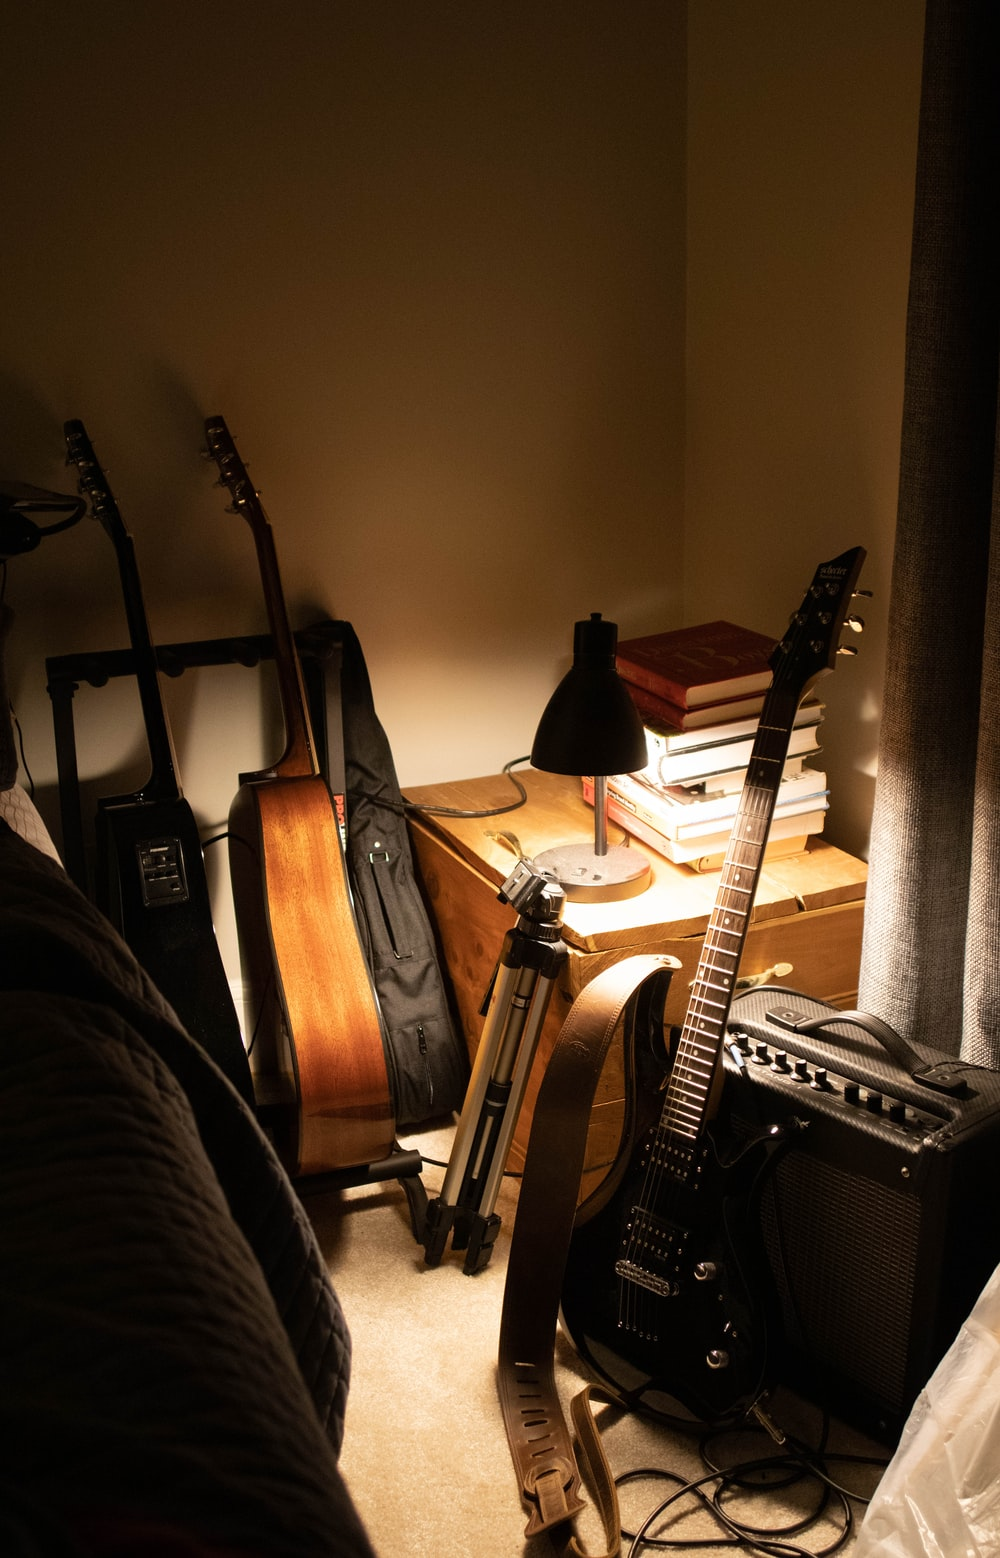 brown acoustic guitar beside black electric guitar